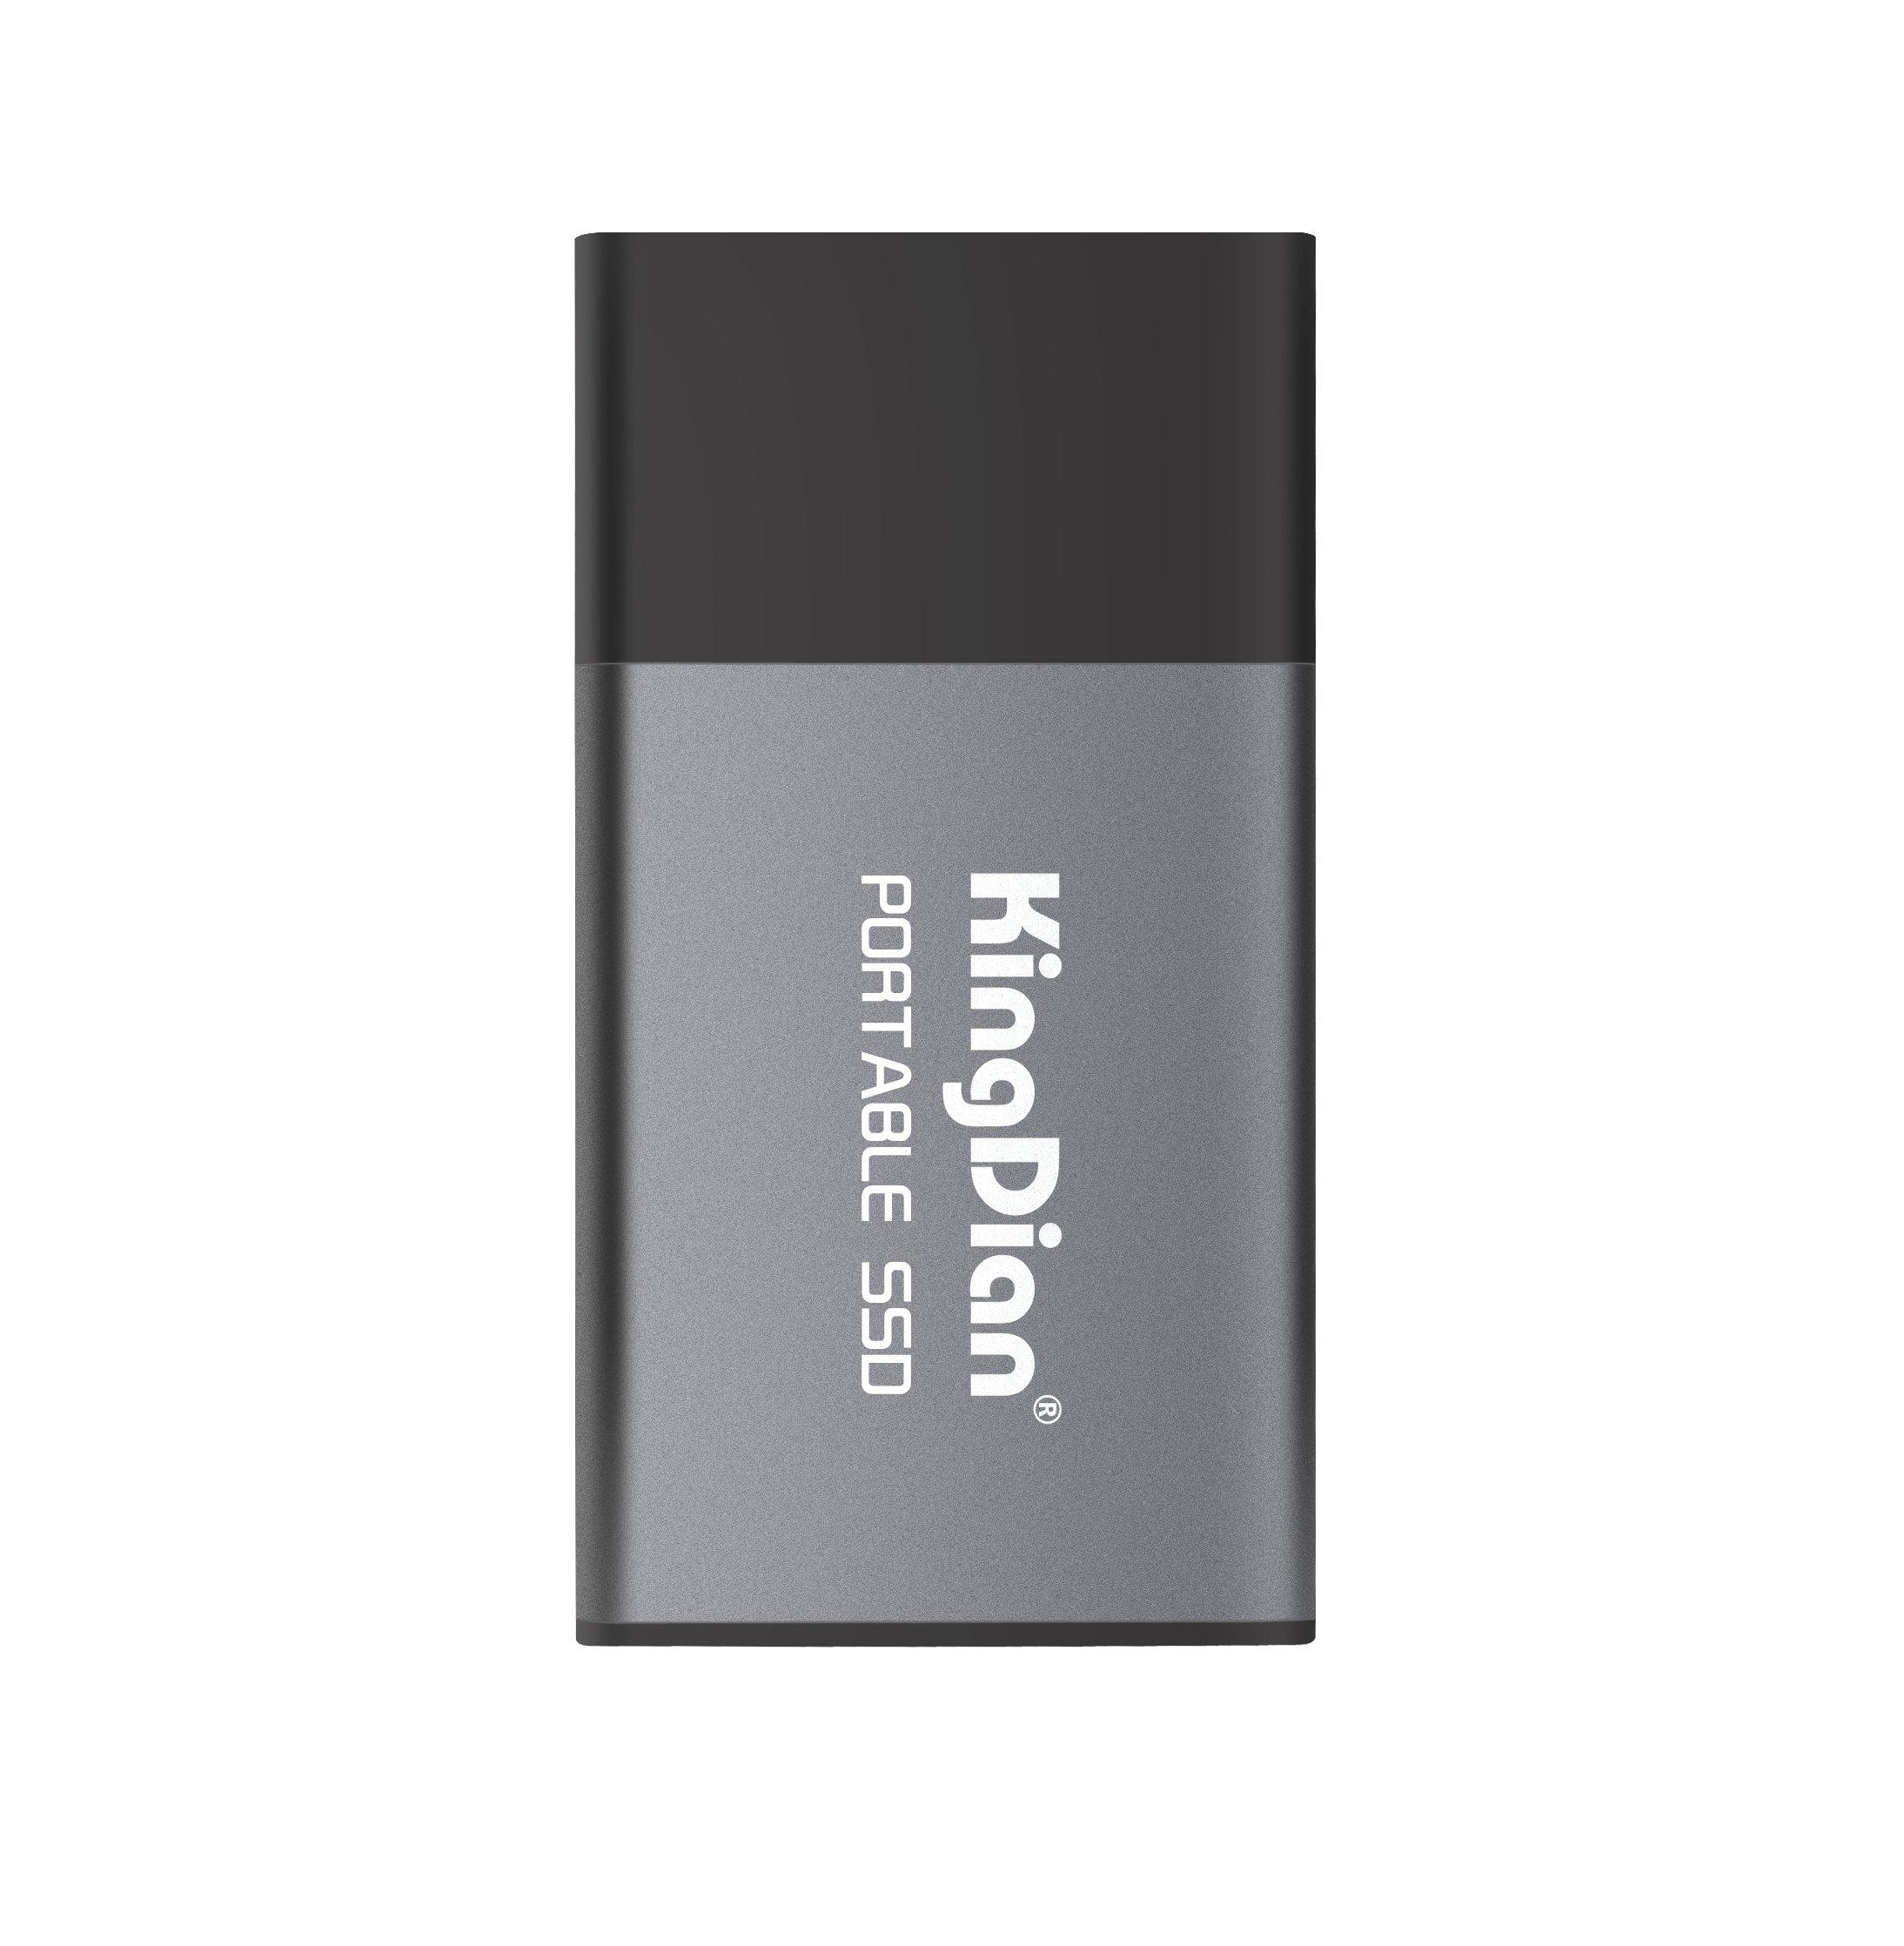 KingDian 120gb 240gb External SSD USB 3.0 Portable Solid State Drive (120GB) by KINGDIAN (Image #2)